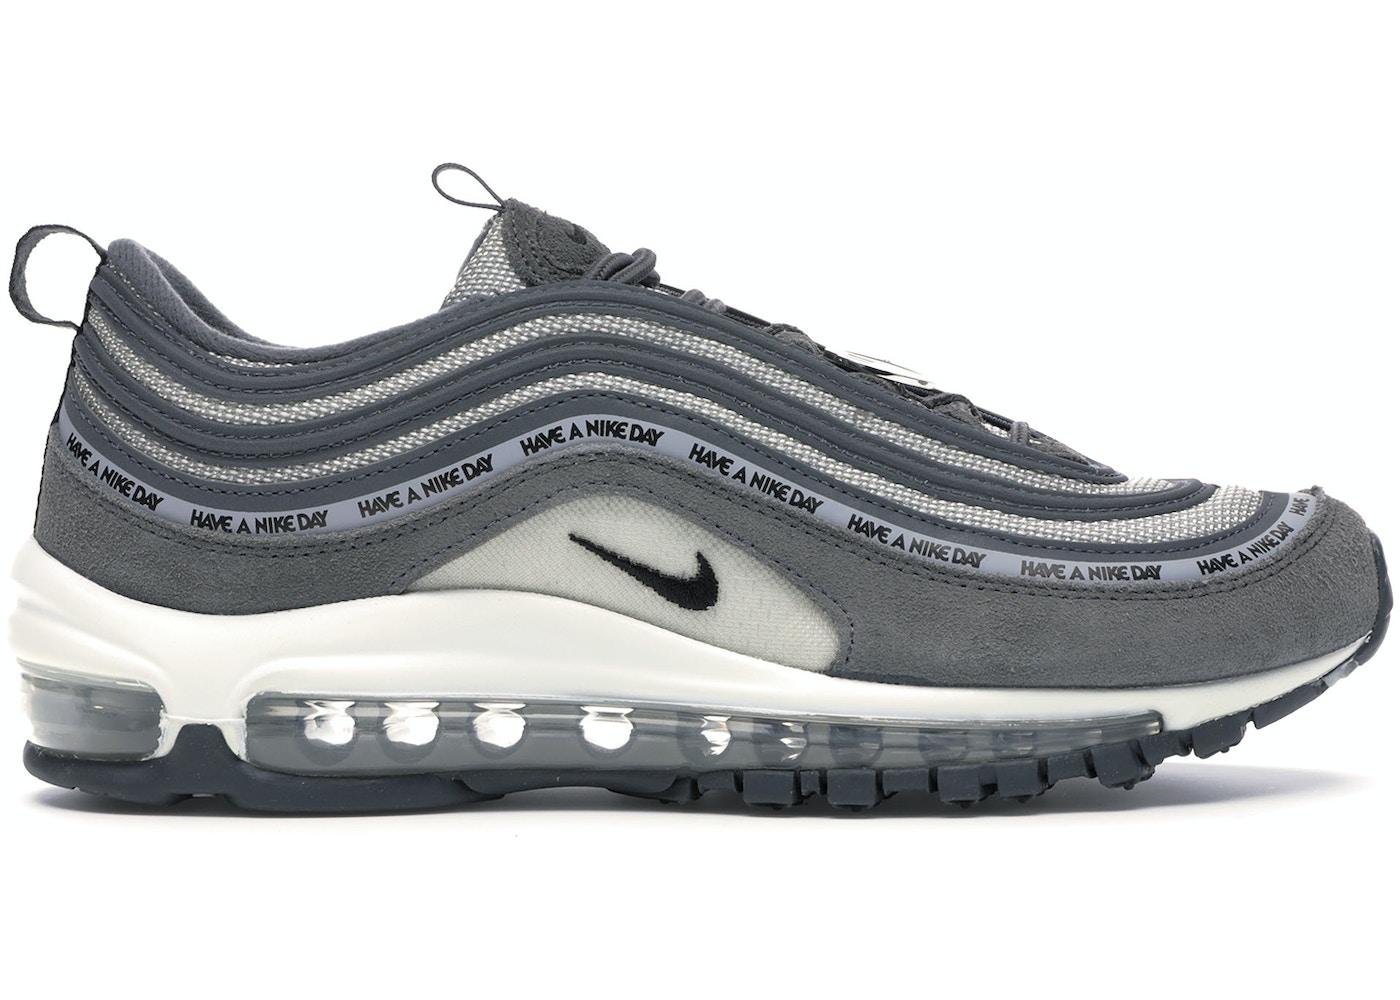 tal vez Hundimiento Chillido  Nike Air Max 97 Have a Nike Day Dark Grey (GS) - 923288-001